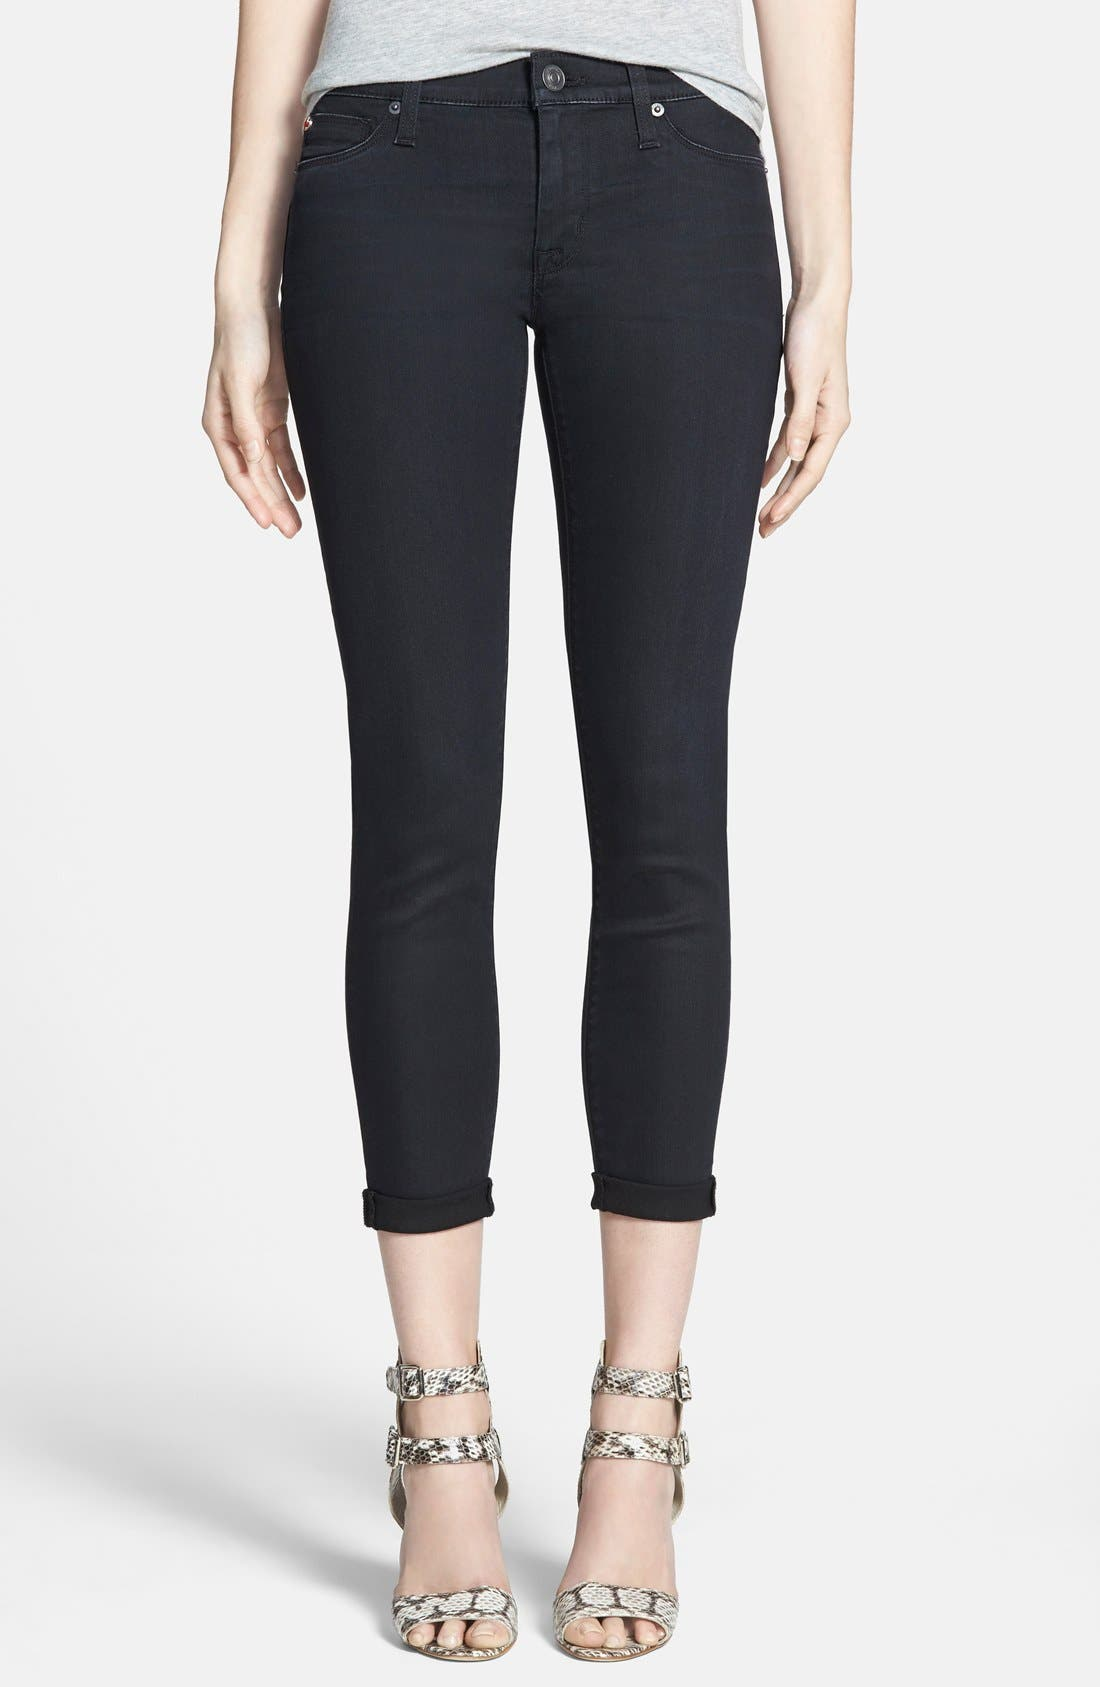 Main Image - Hudson Jeans 'Harkin' Skinny Jeans (Shrine)